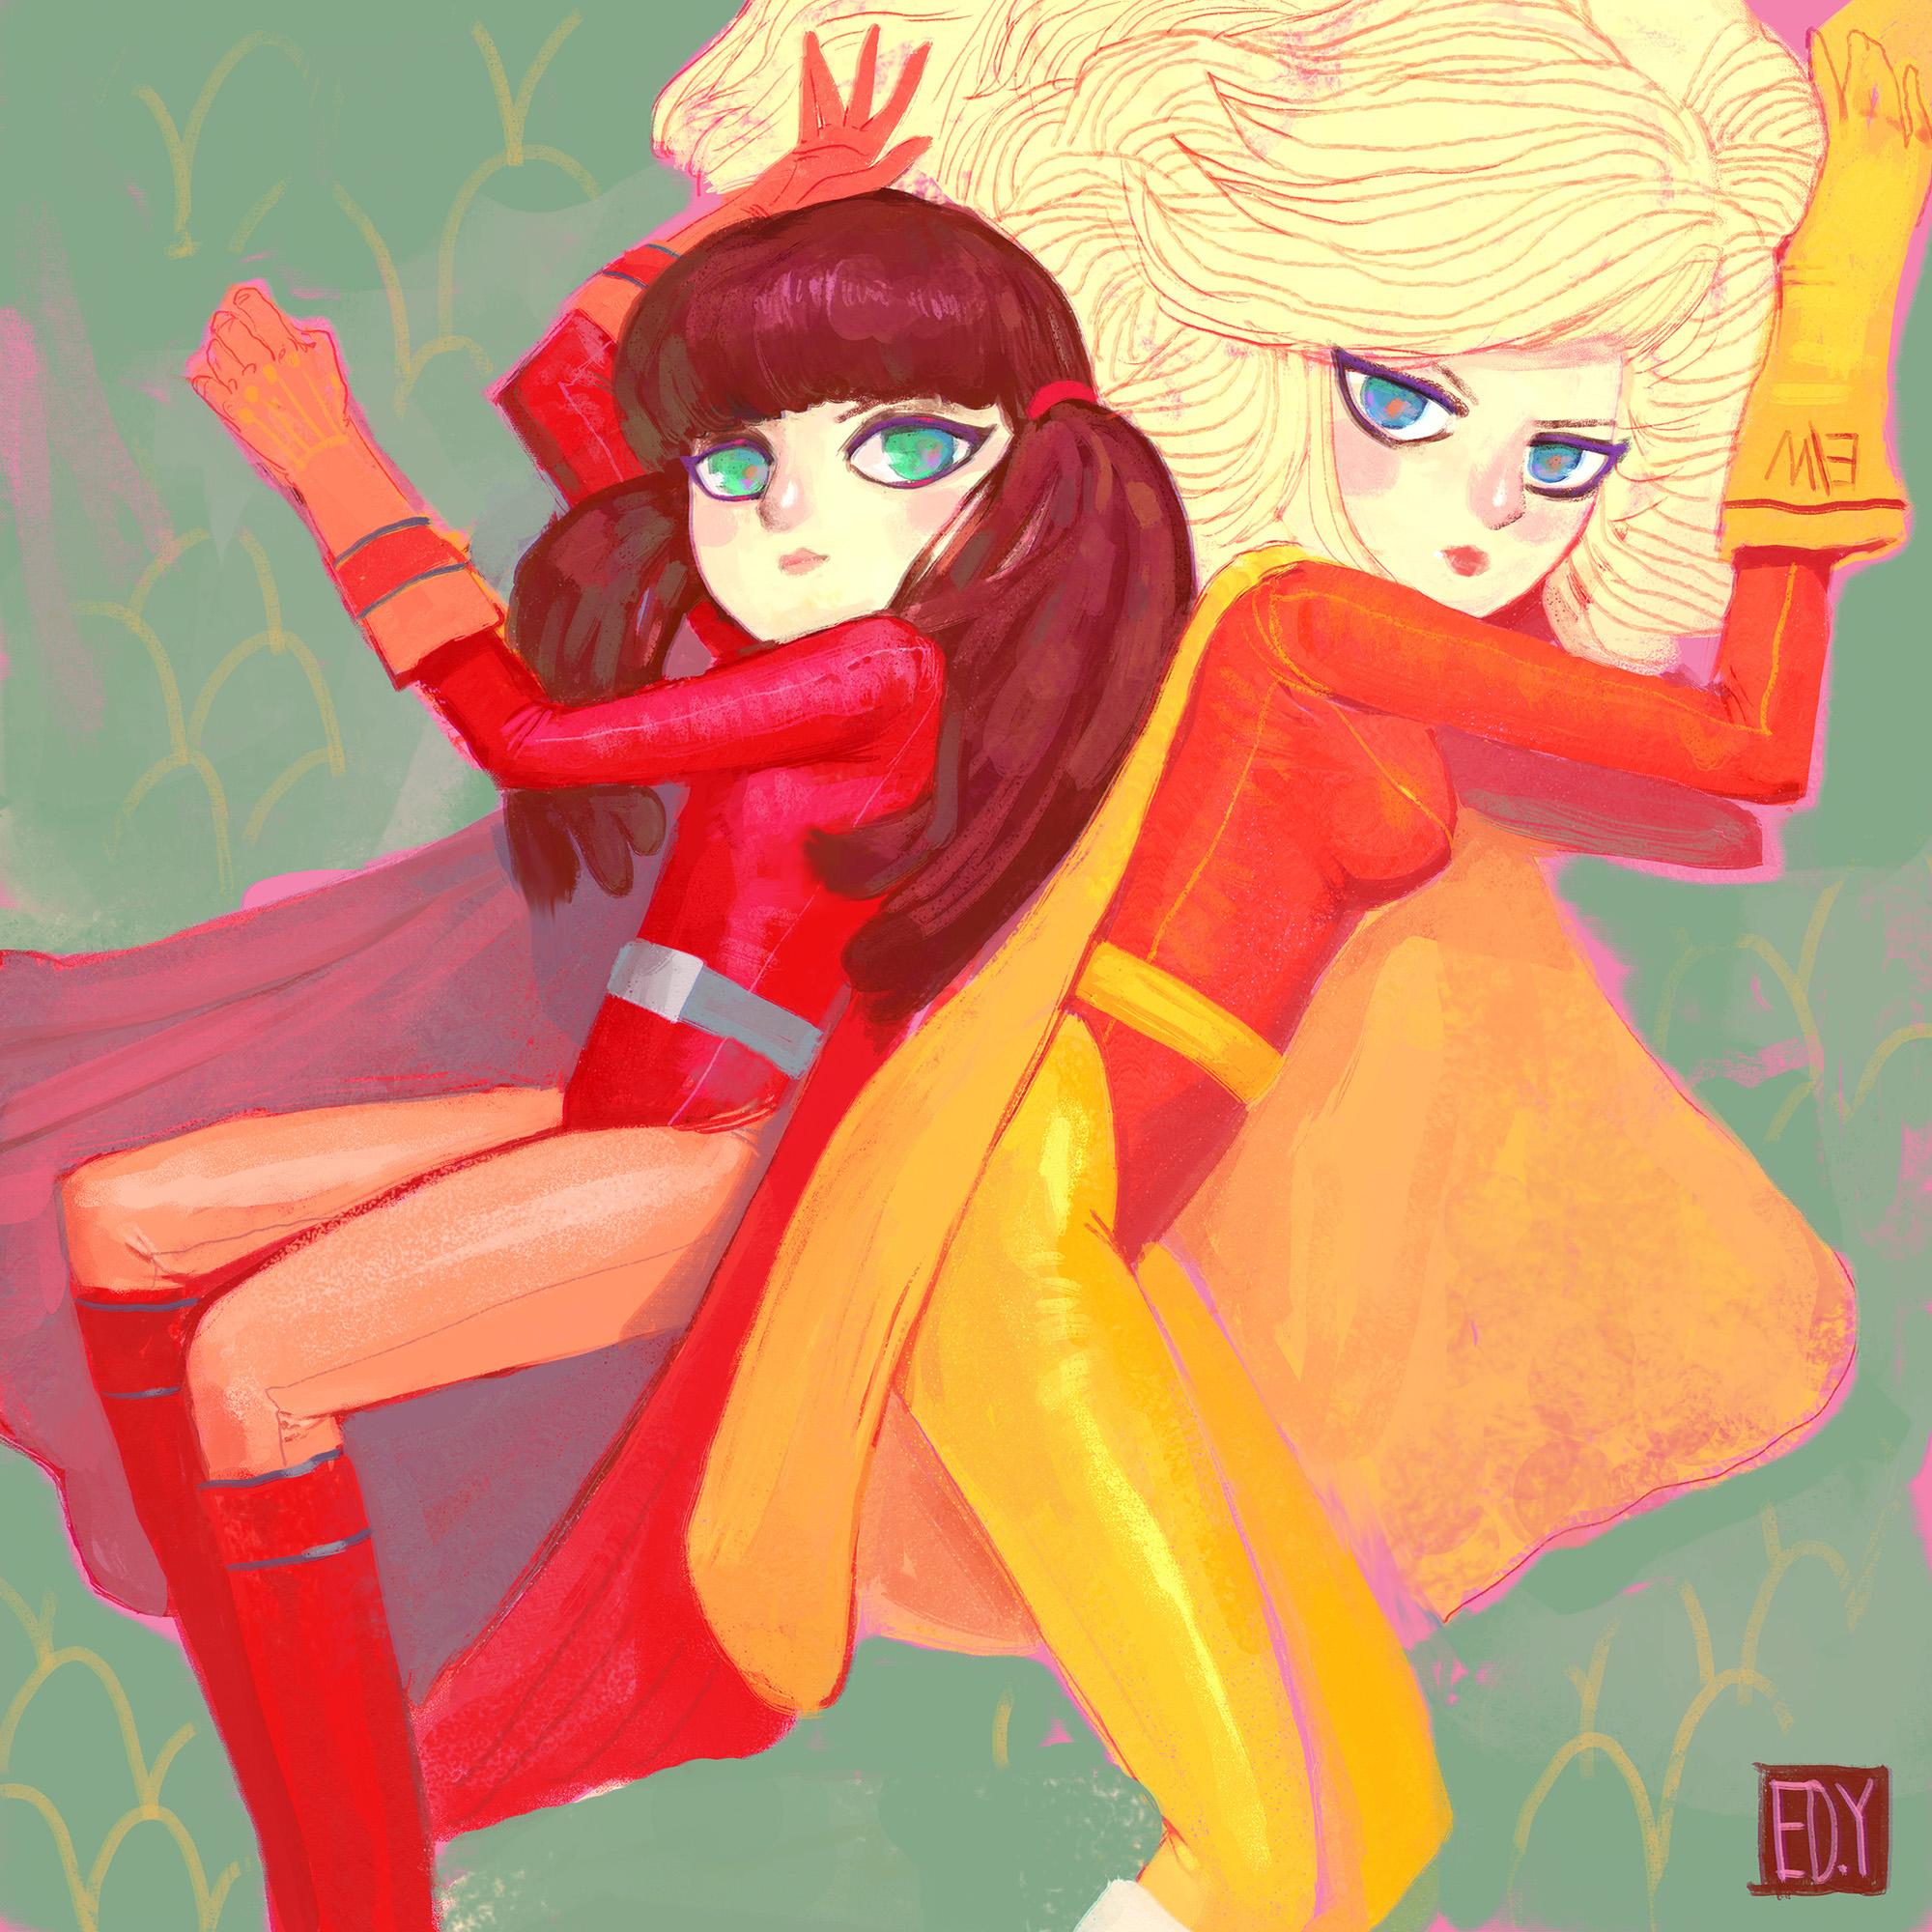 Electra&Dyna01_edy_sm.jpg